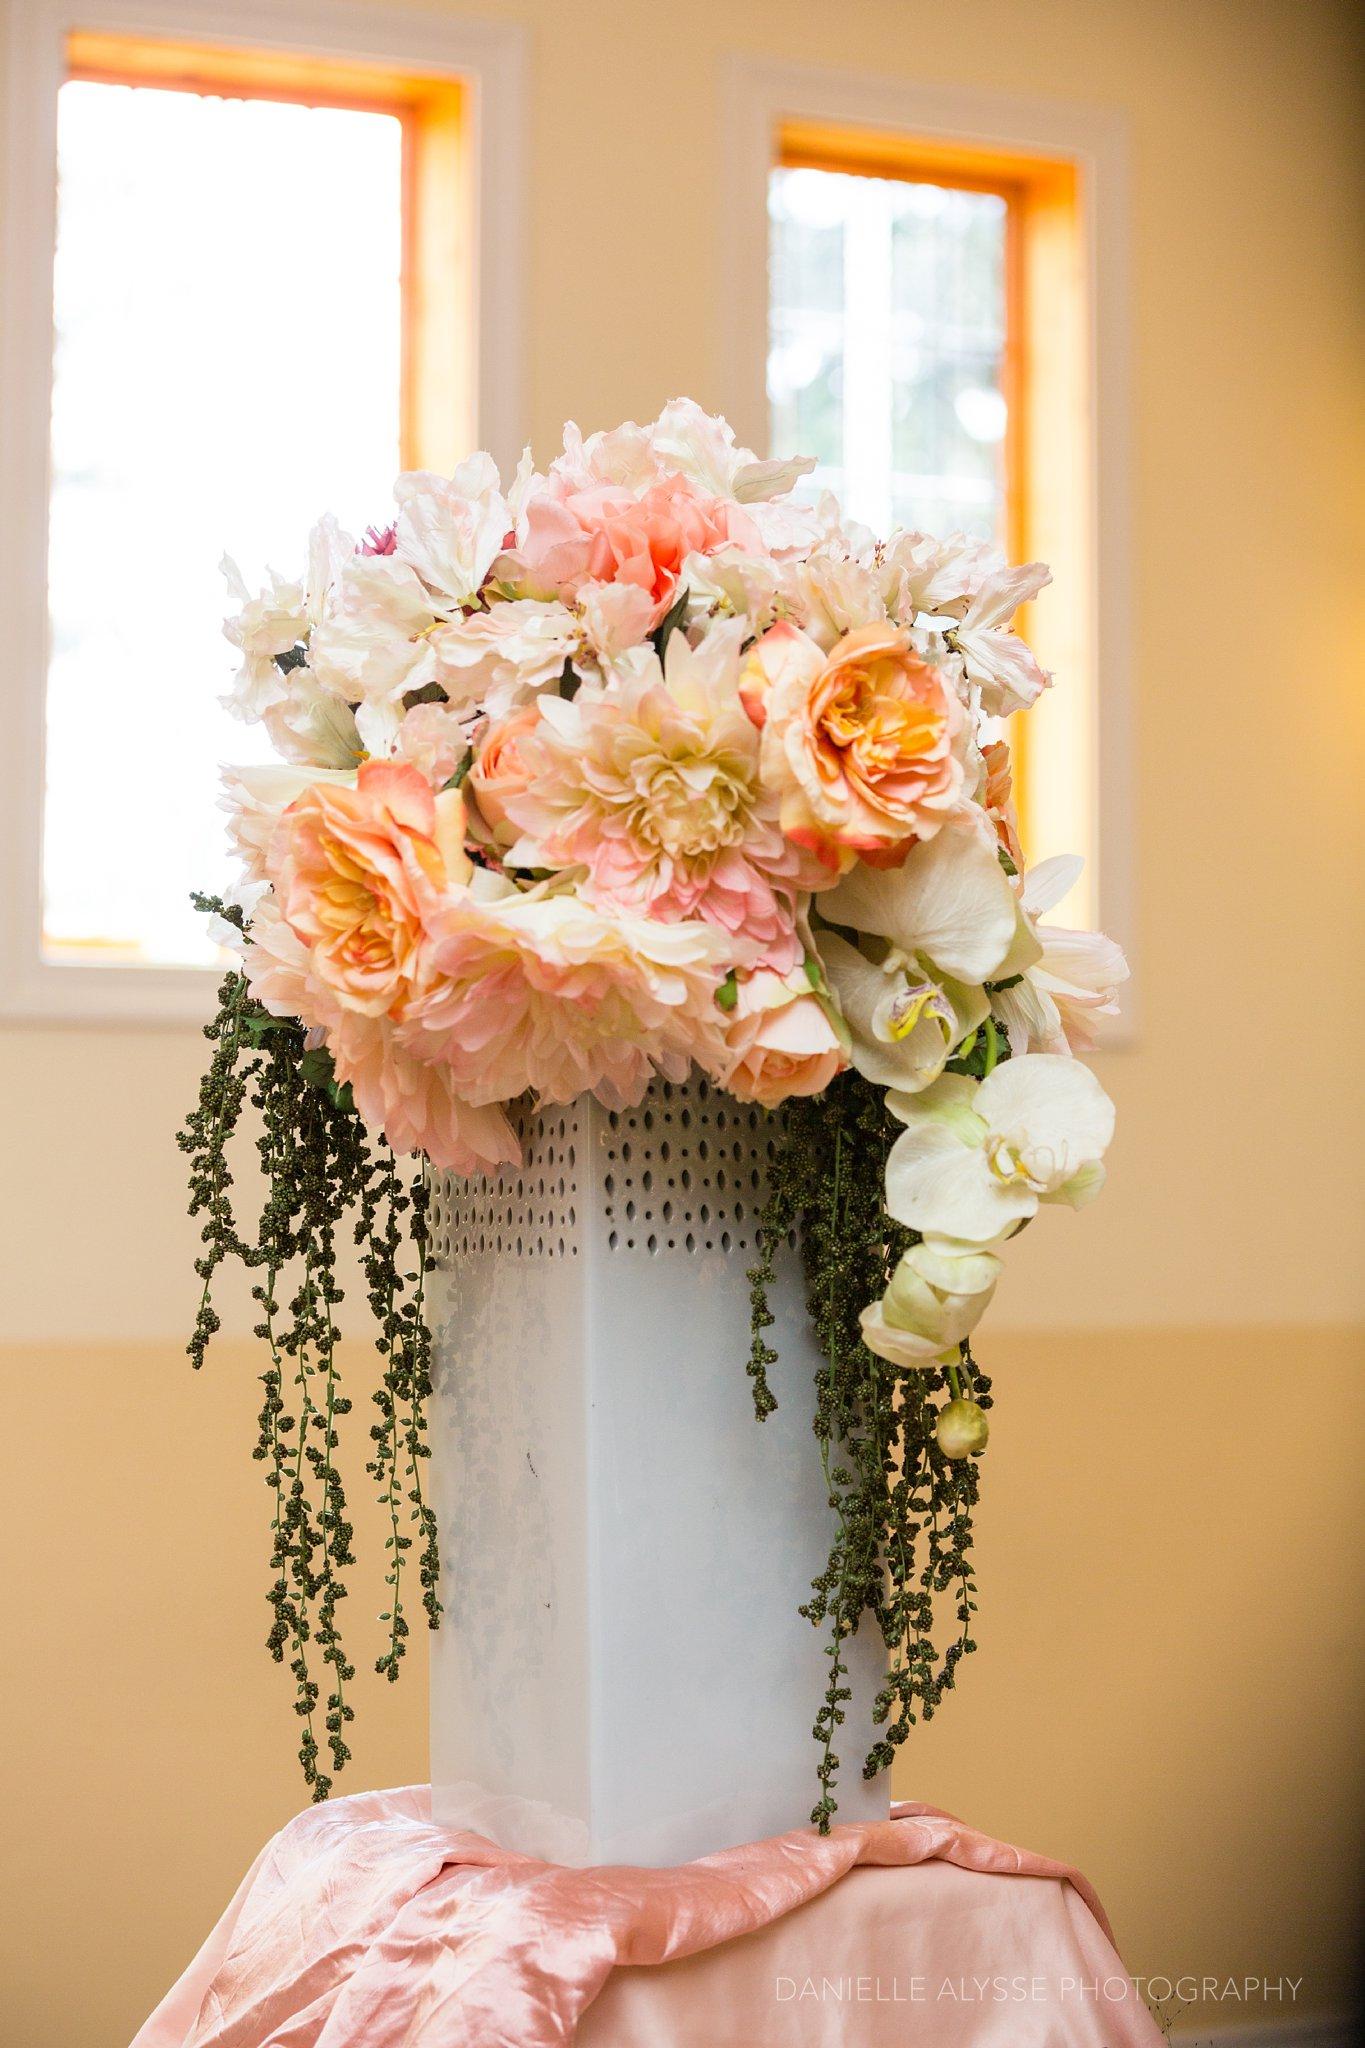 170507_blog_megan_david_wedding_loomis_flower_farm_inn_danielle_alysse_photography_sacramento_photographer0435_WEB.jpg